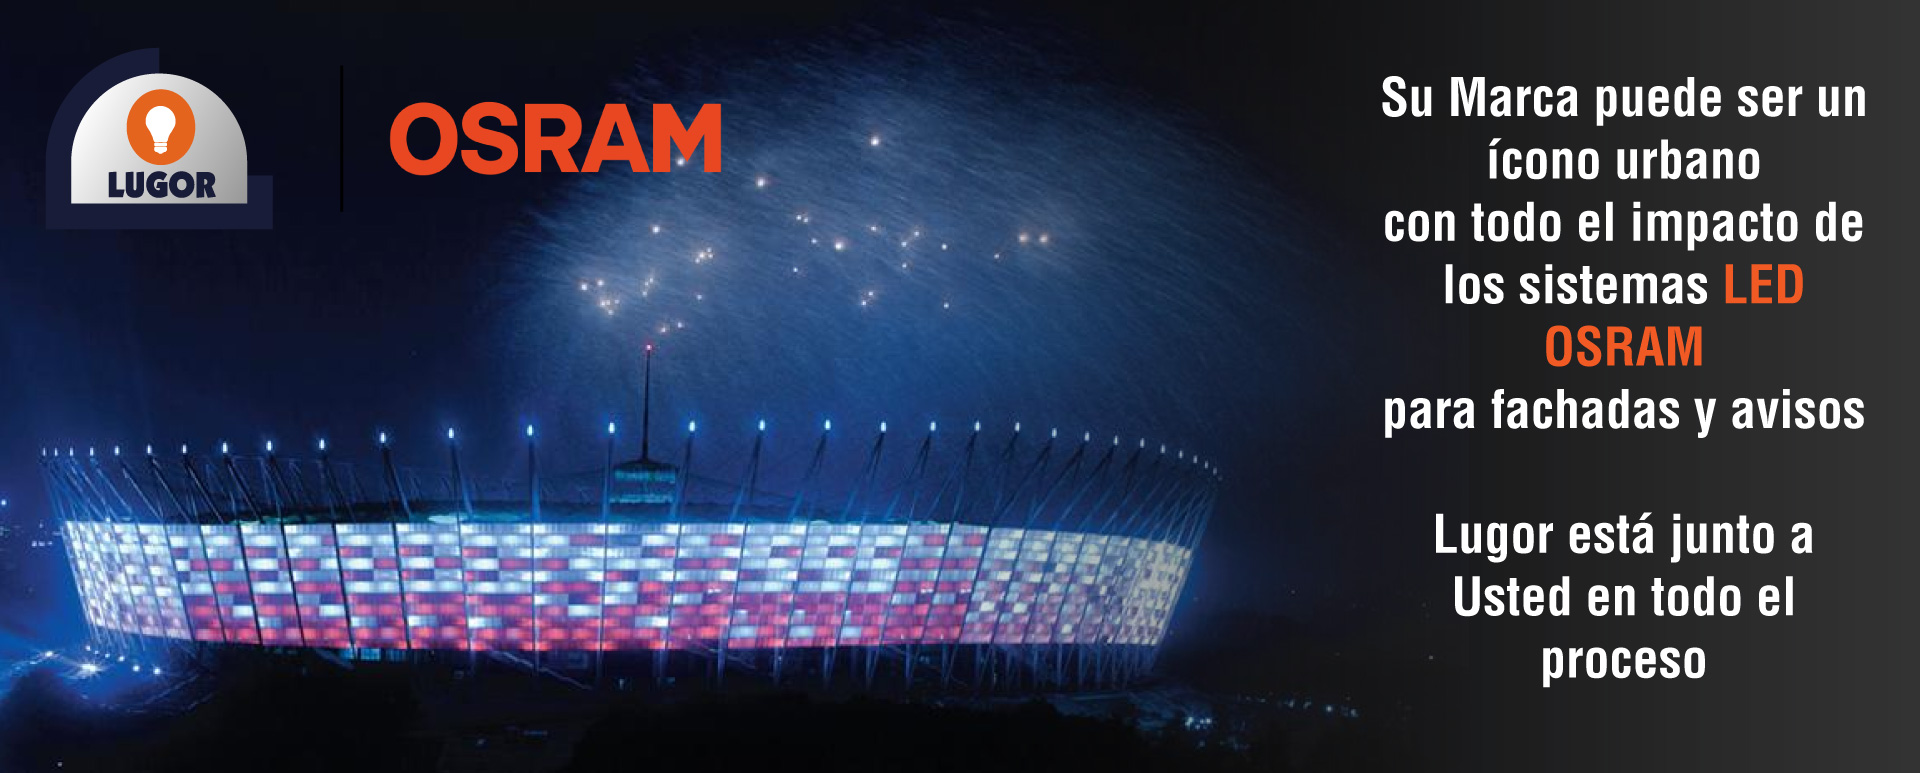 Iluminacion-LED-para-avisos-OSRAM-LUGOR